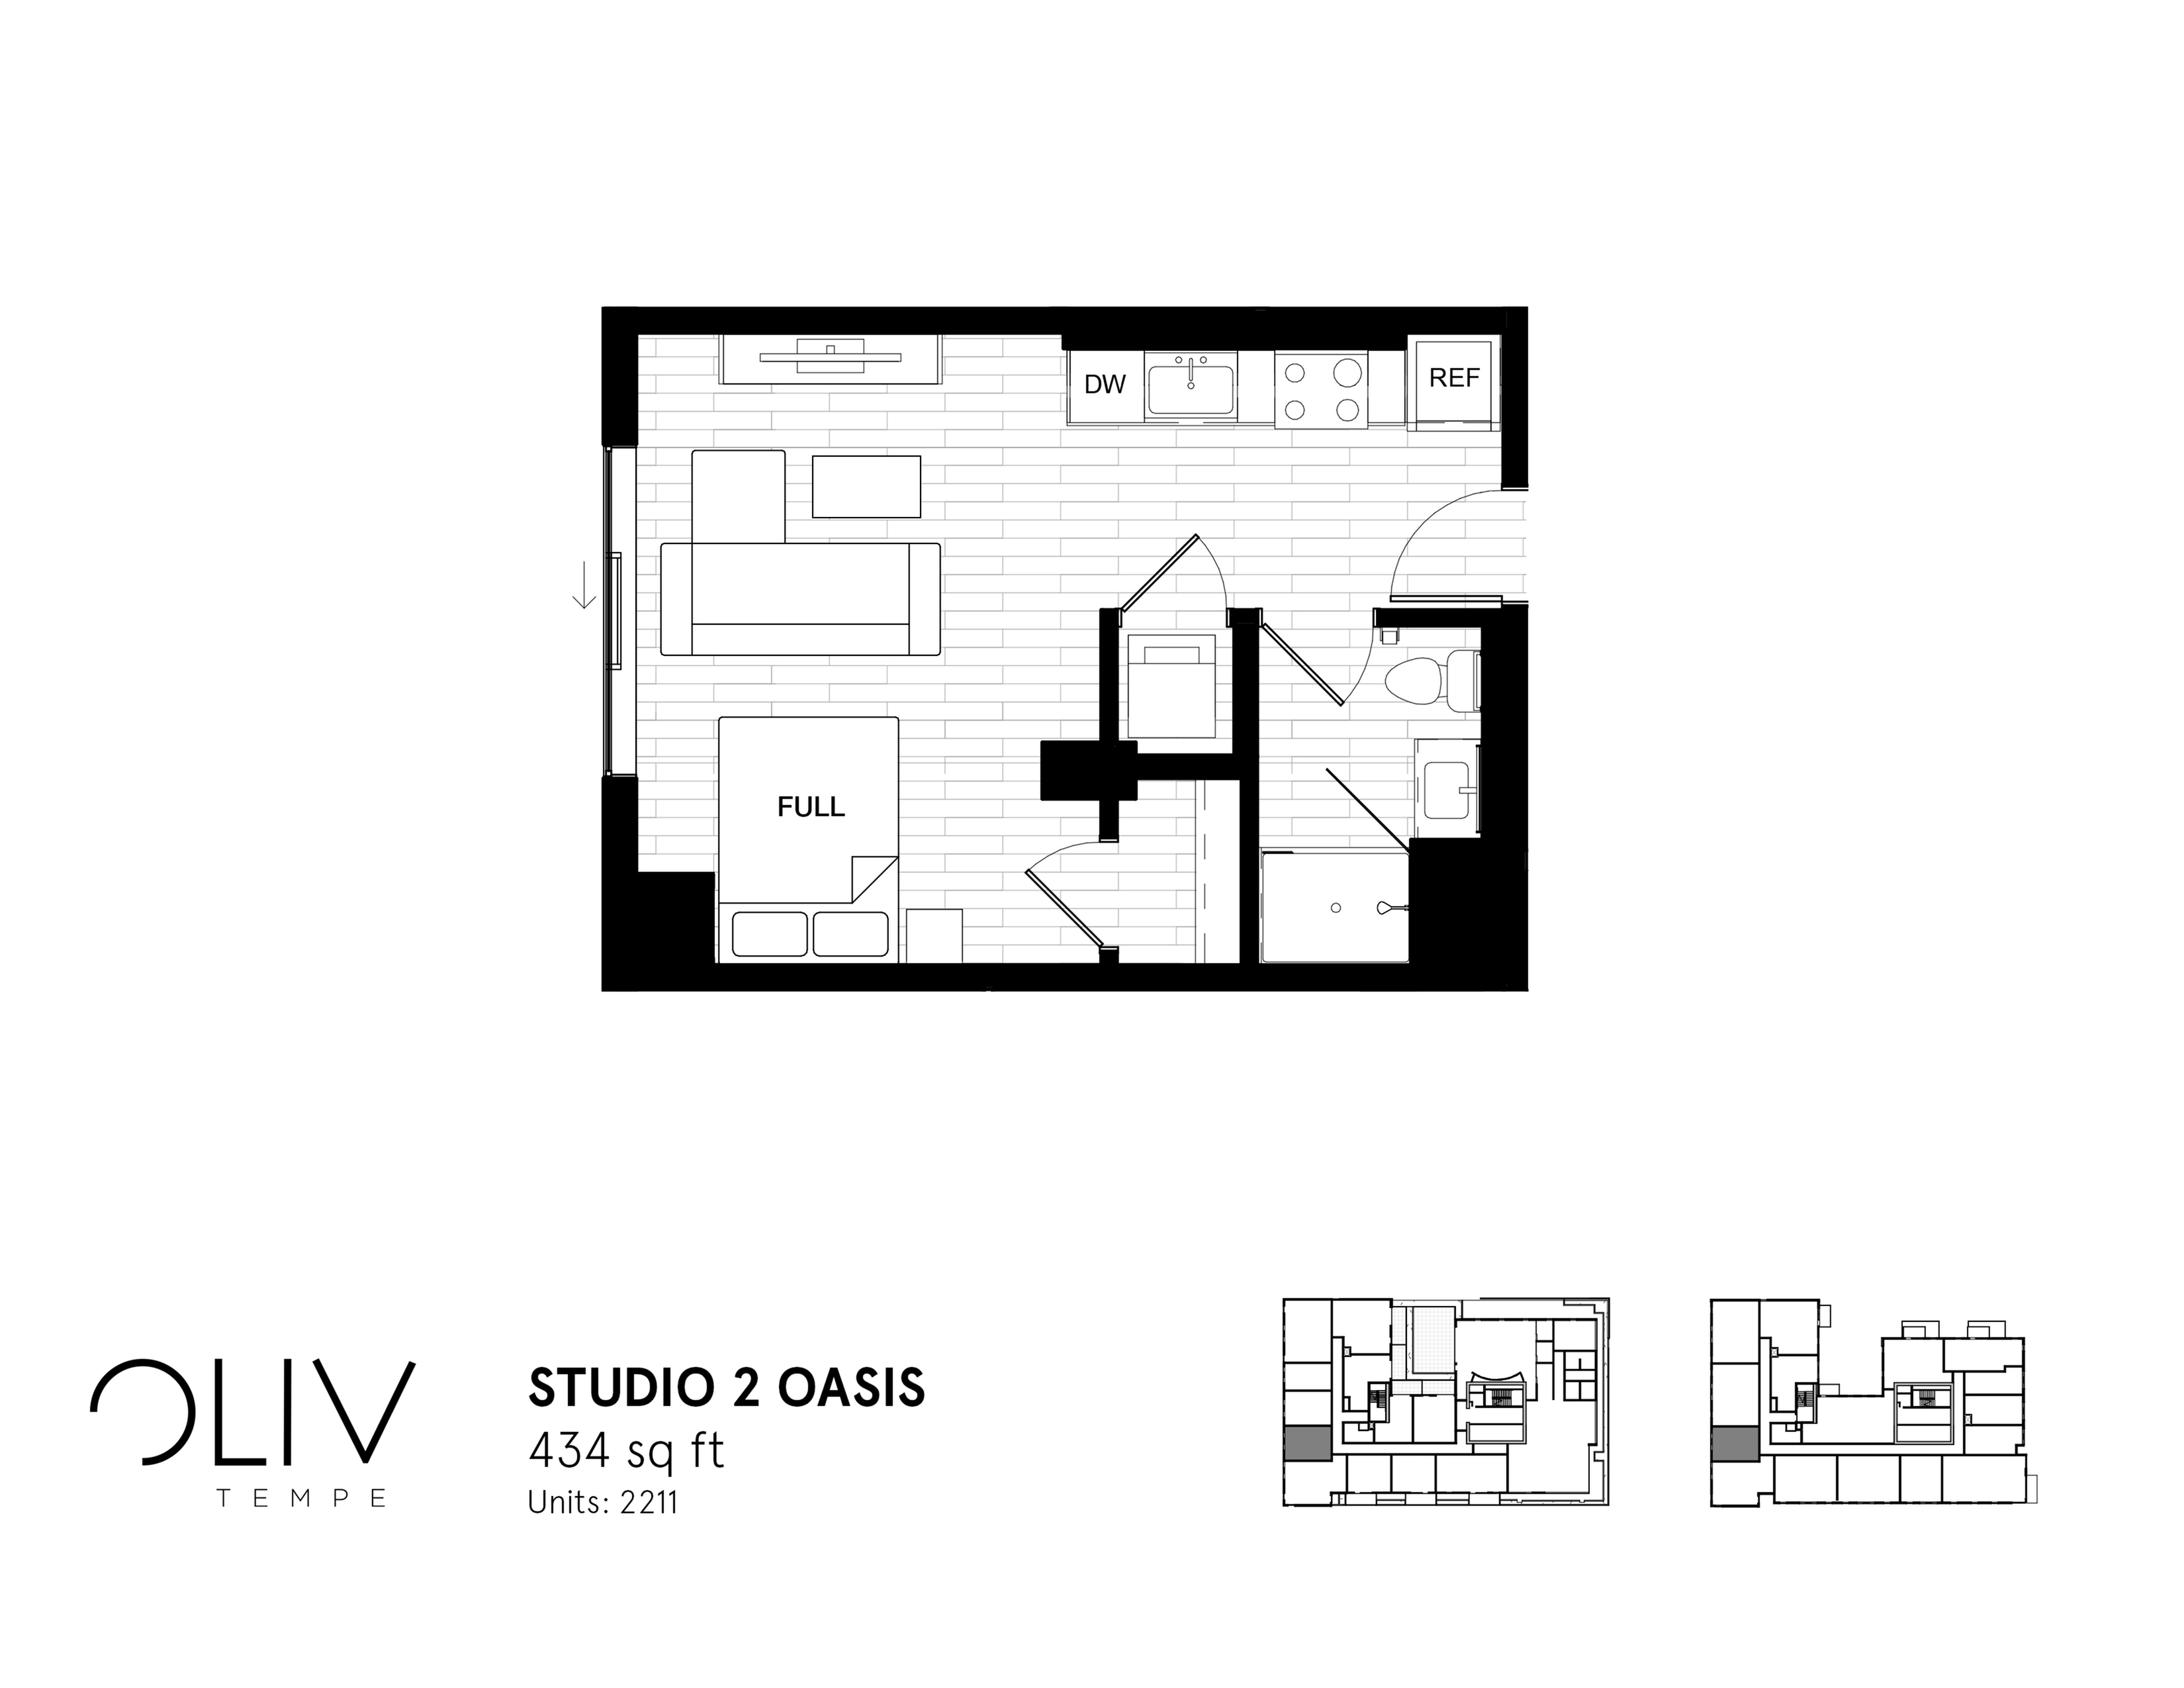 Studio 2 Oasis